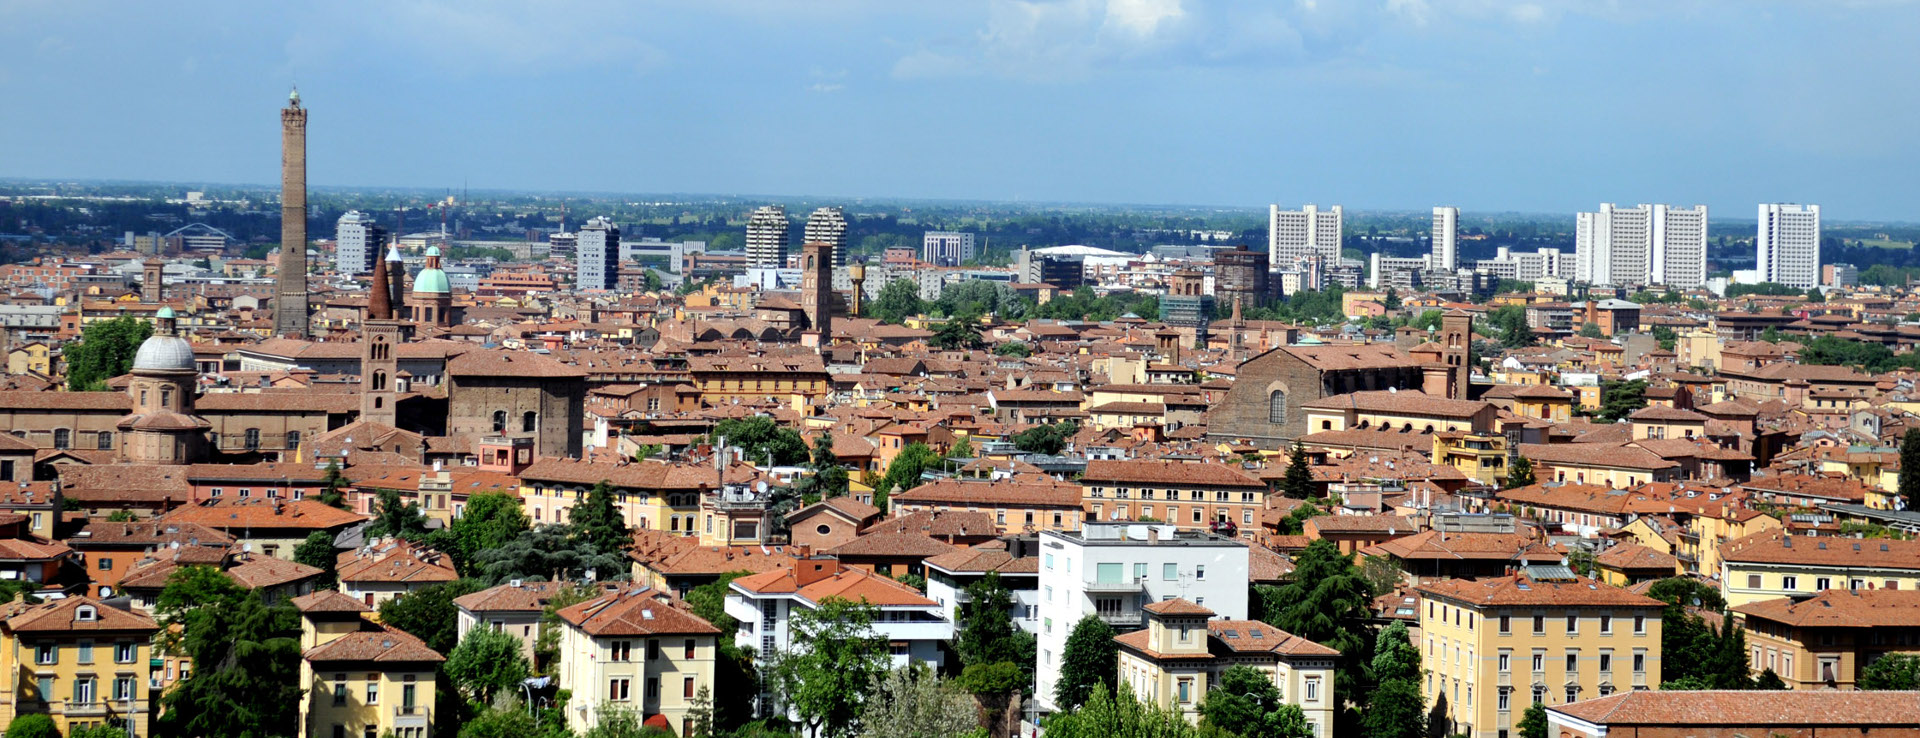 Panorama di Bologna - Archivio Città metropolitana